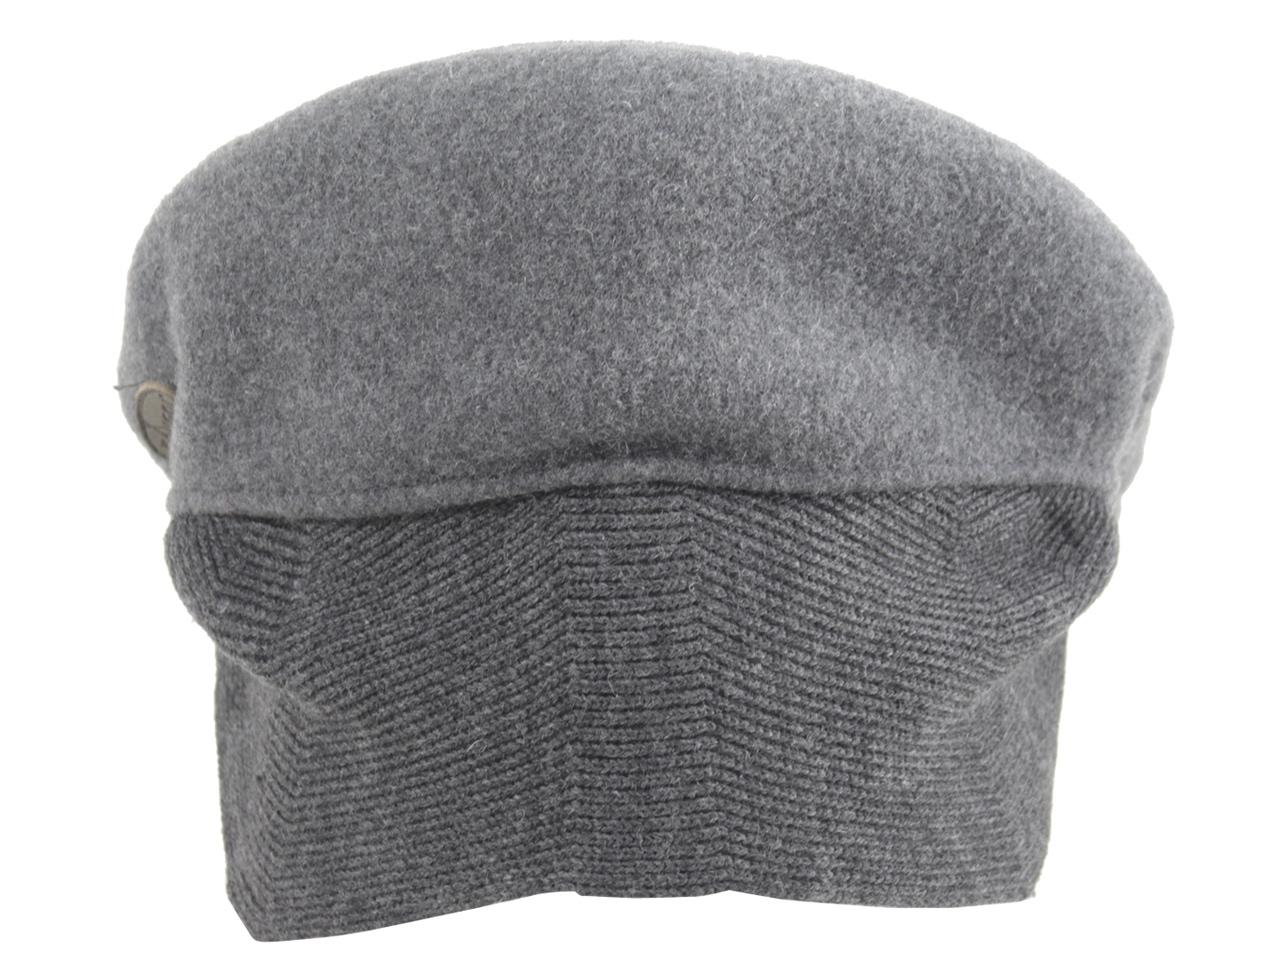 ffd6268f04 Details about Kangol Men's Wool 504 Earlap Flat Cap Hat